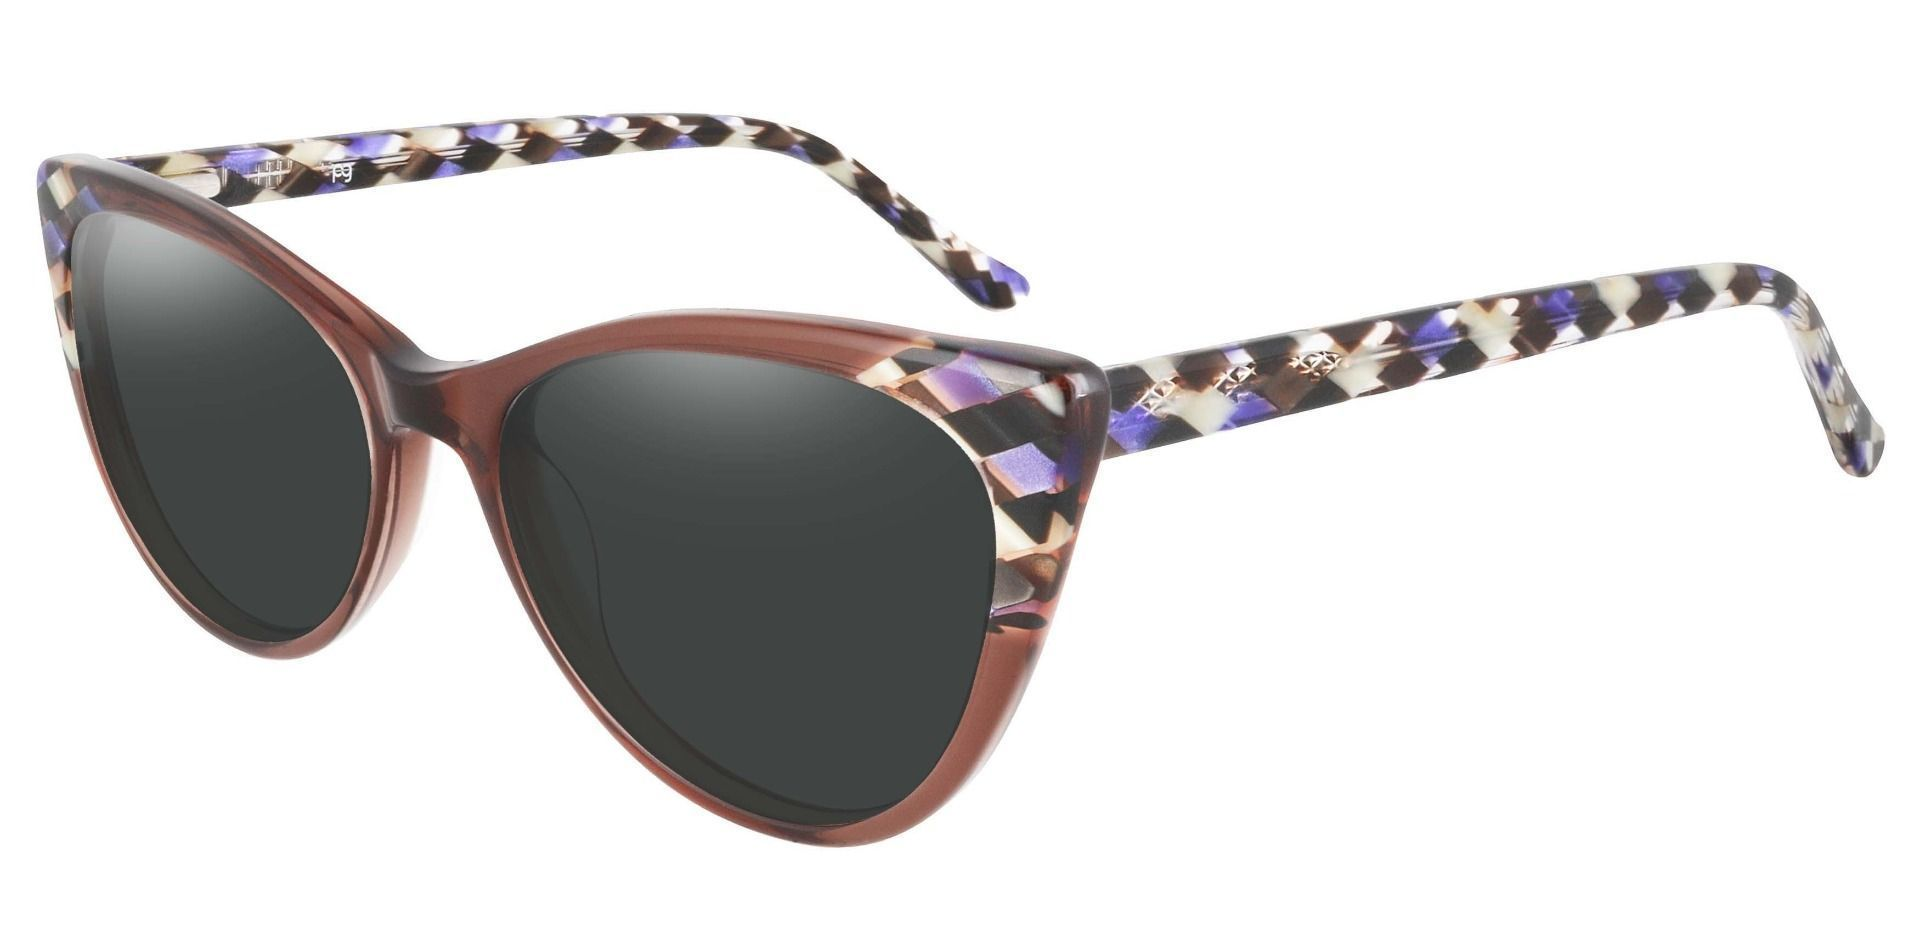 Mavis Cat Eye Prescription Sunglasses - Purple Frame With Gray Lenses